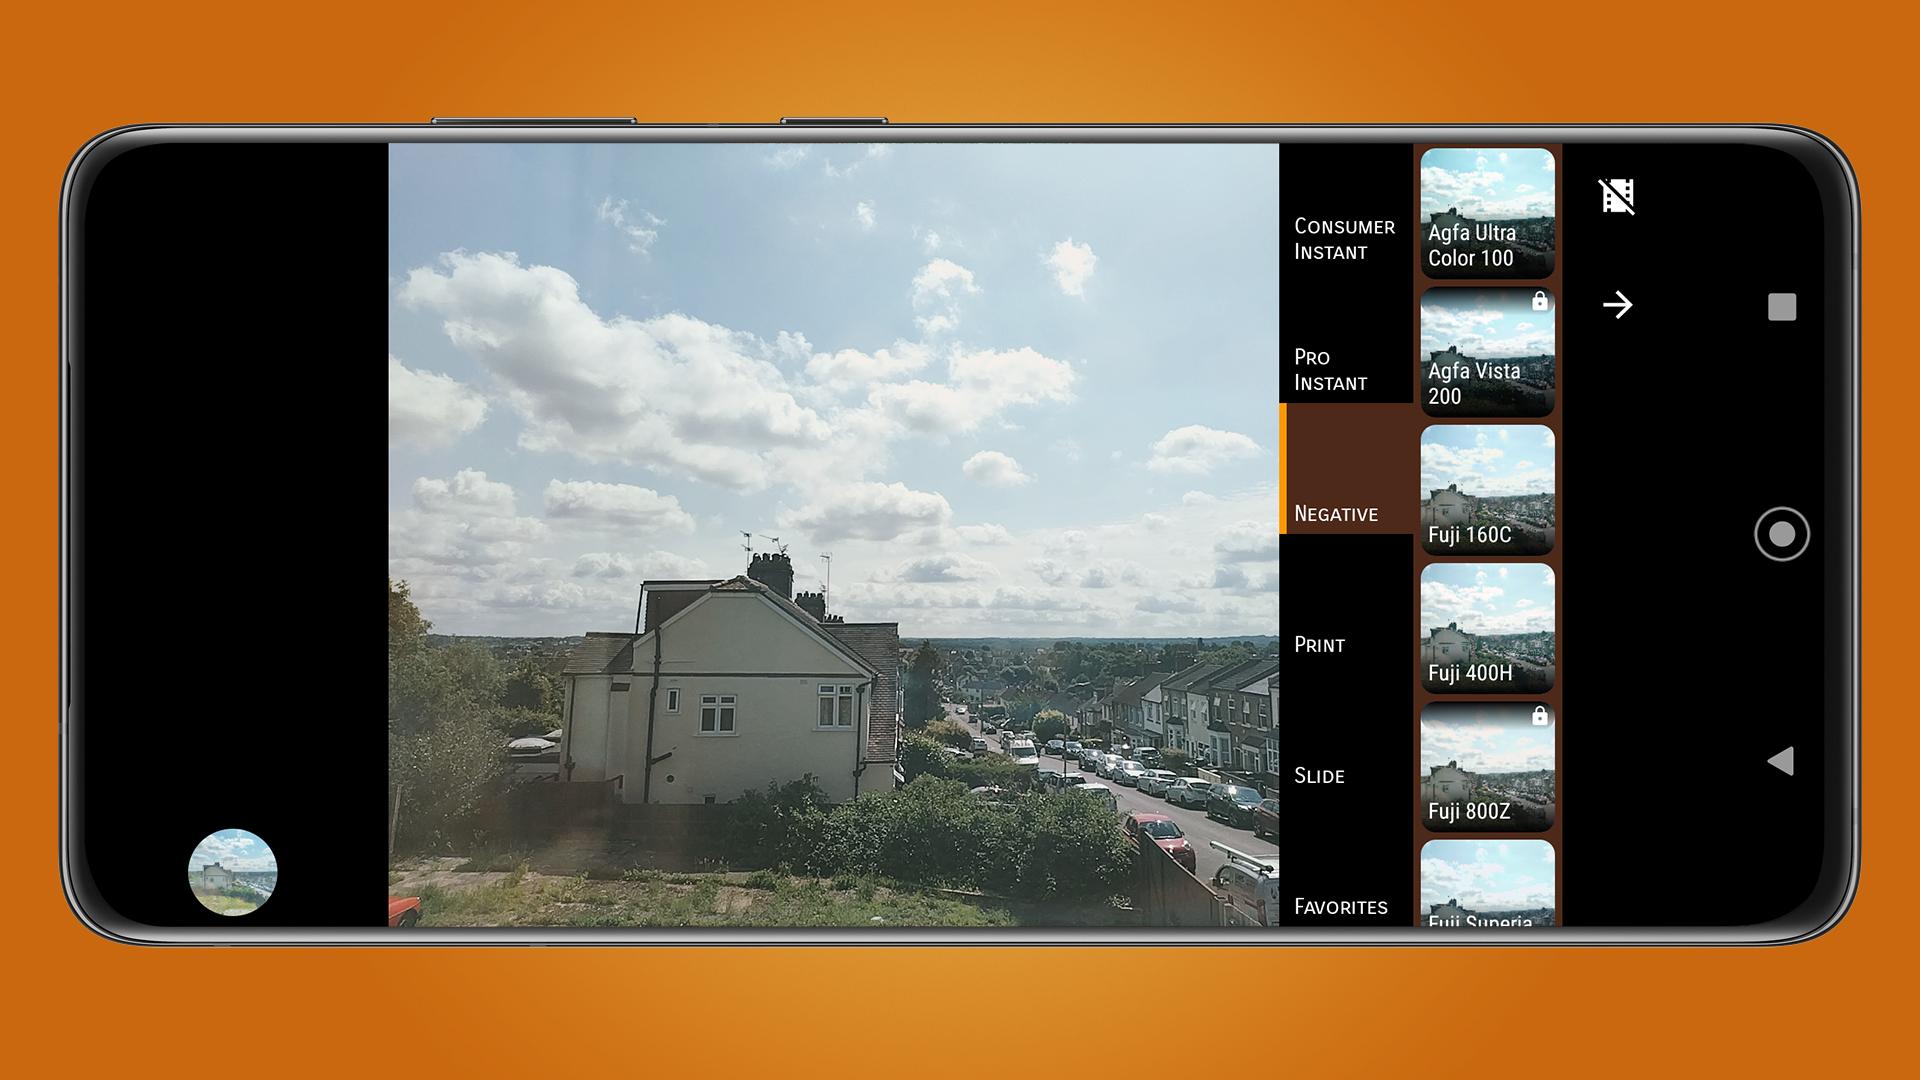 A photo of some houses in the Ektacam app